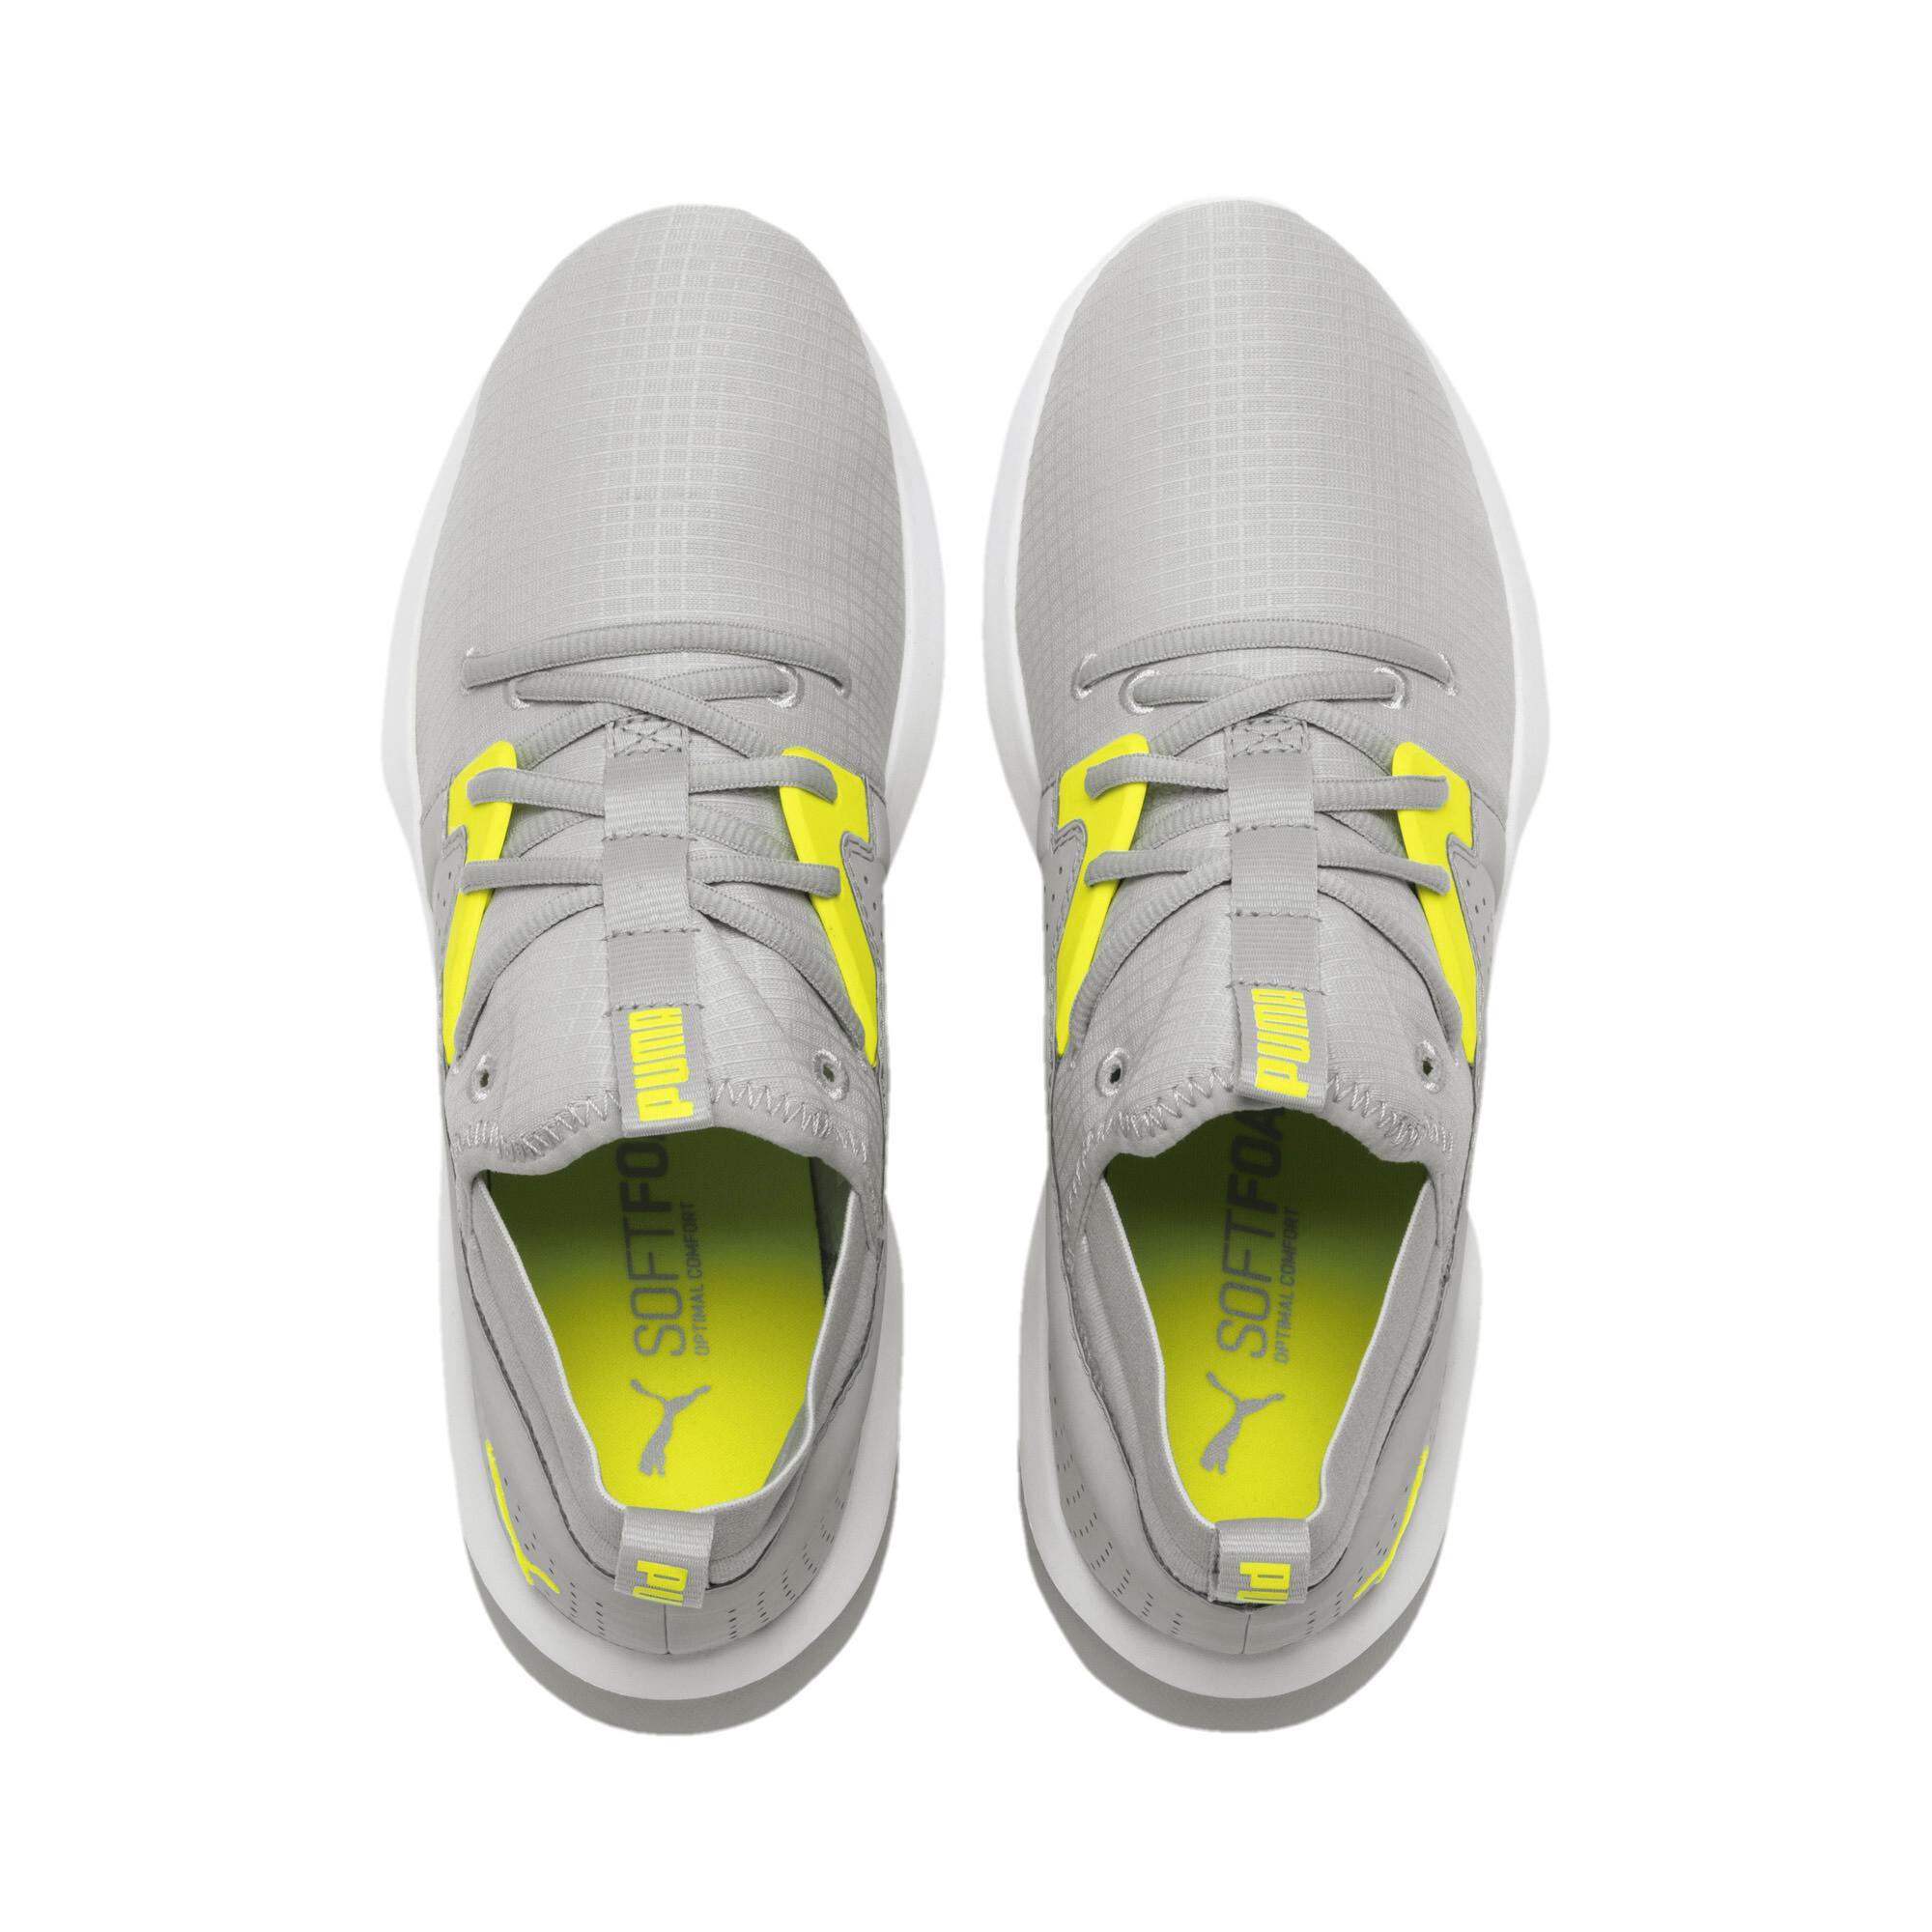 PUMA-Men-039-s-Emergence-Lights-Training-Shoes thumbnail 8